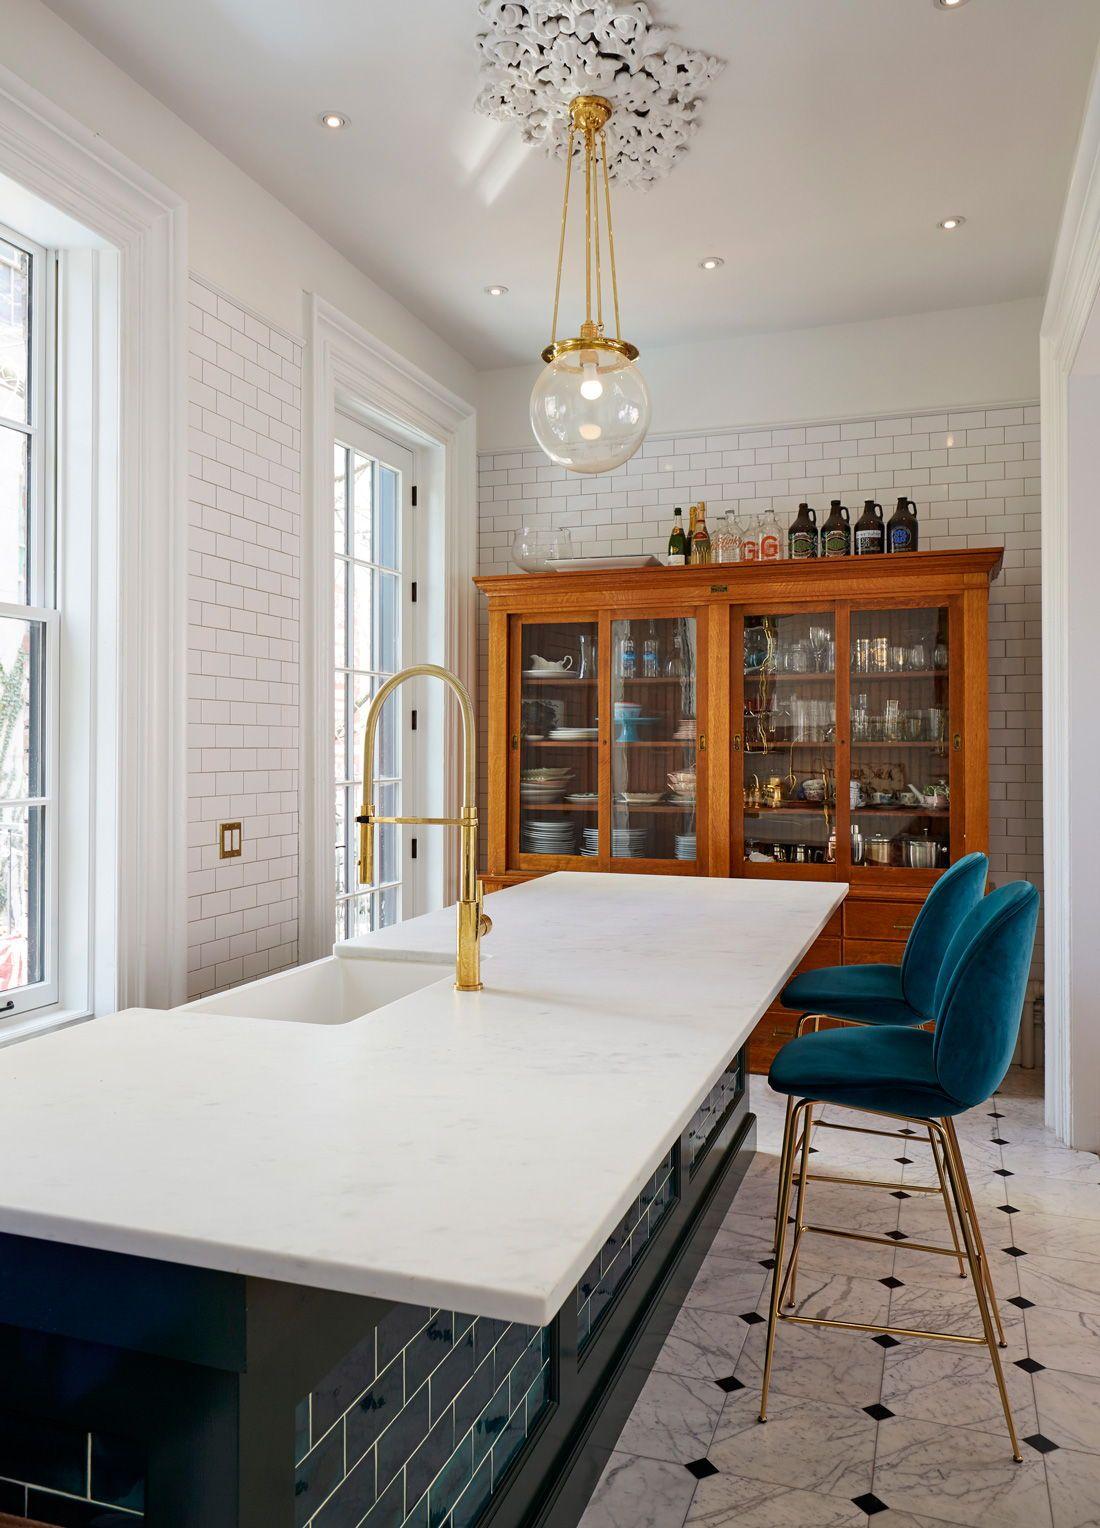 Bluegrass Subway Tile Kitchen Island Tile By Mercury Mosaics Home Decor Home Decor Kitchen House Interior